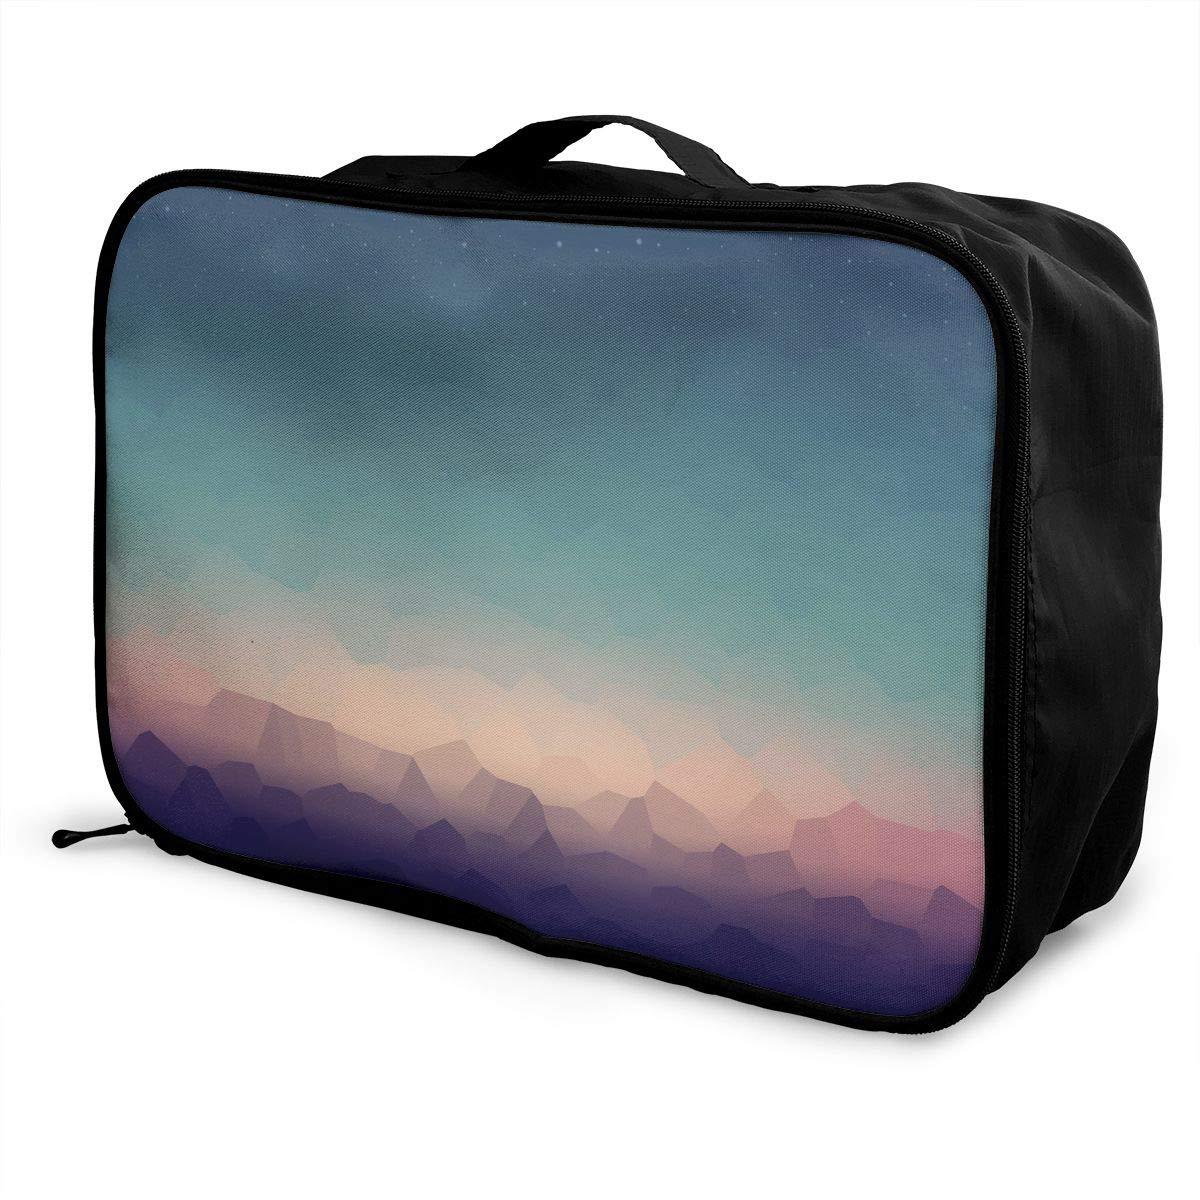 Travel Luggage Duffle Bag Lightweight Portable Handbag Sunset Pattern Large Capacity Waterproof Foldable Storage Tote